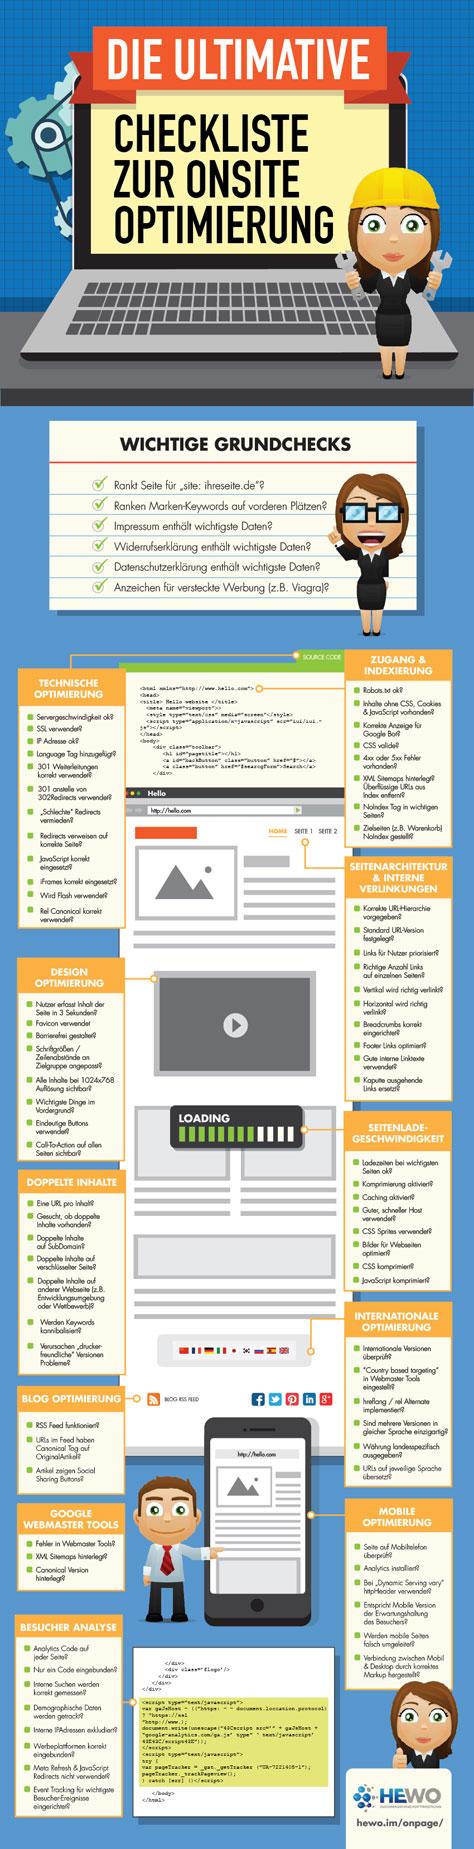 Onsite-Optimierung-Checkliste Infografik